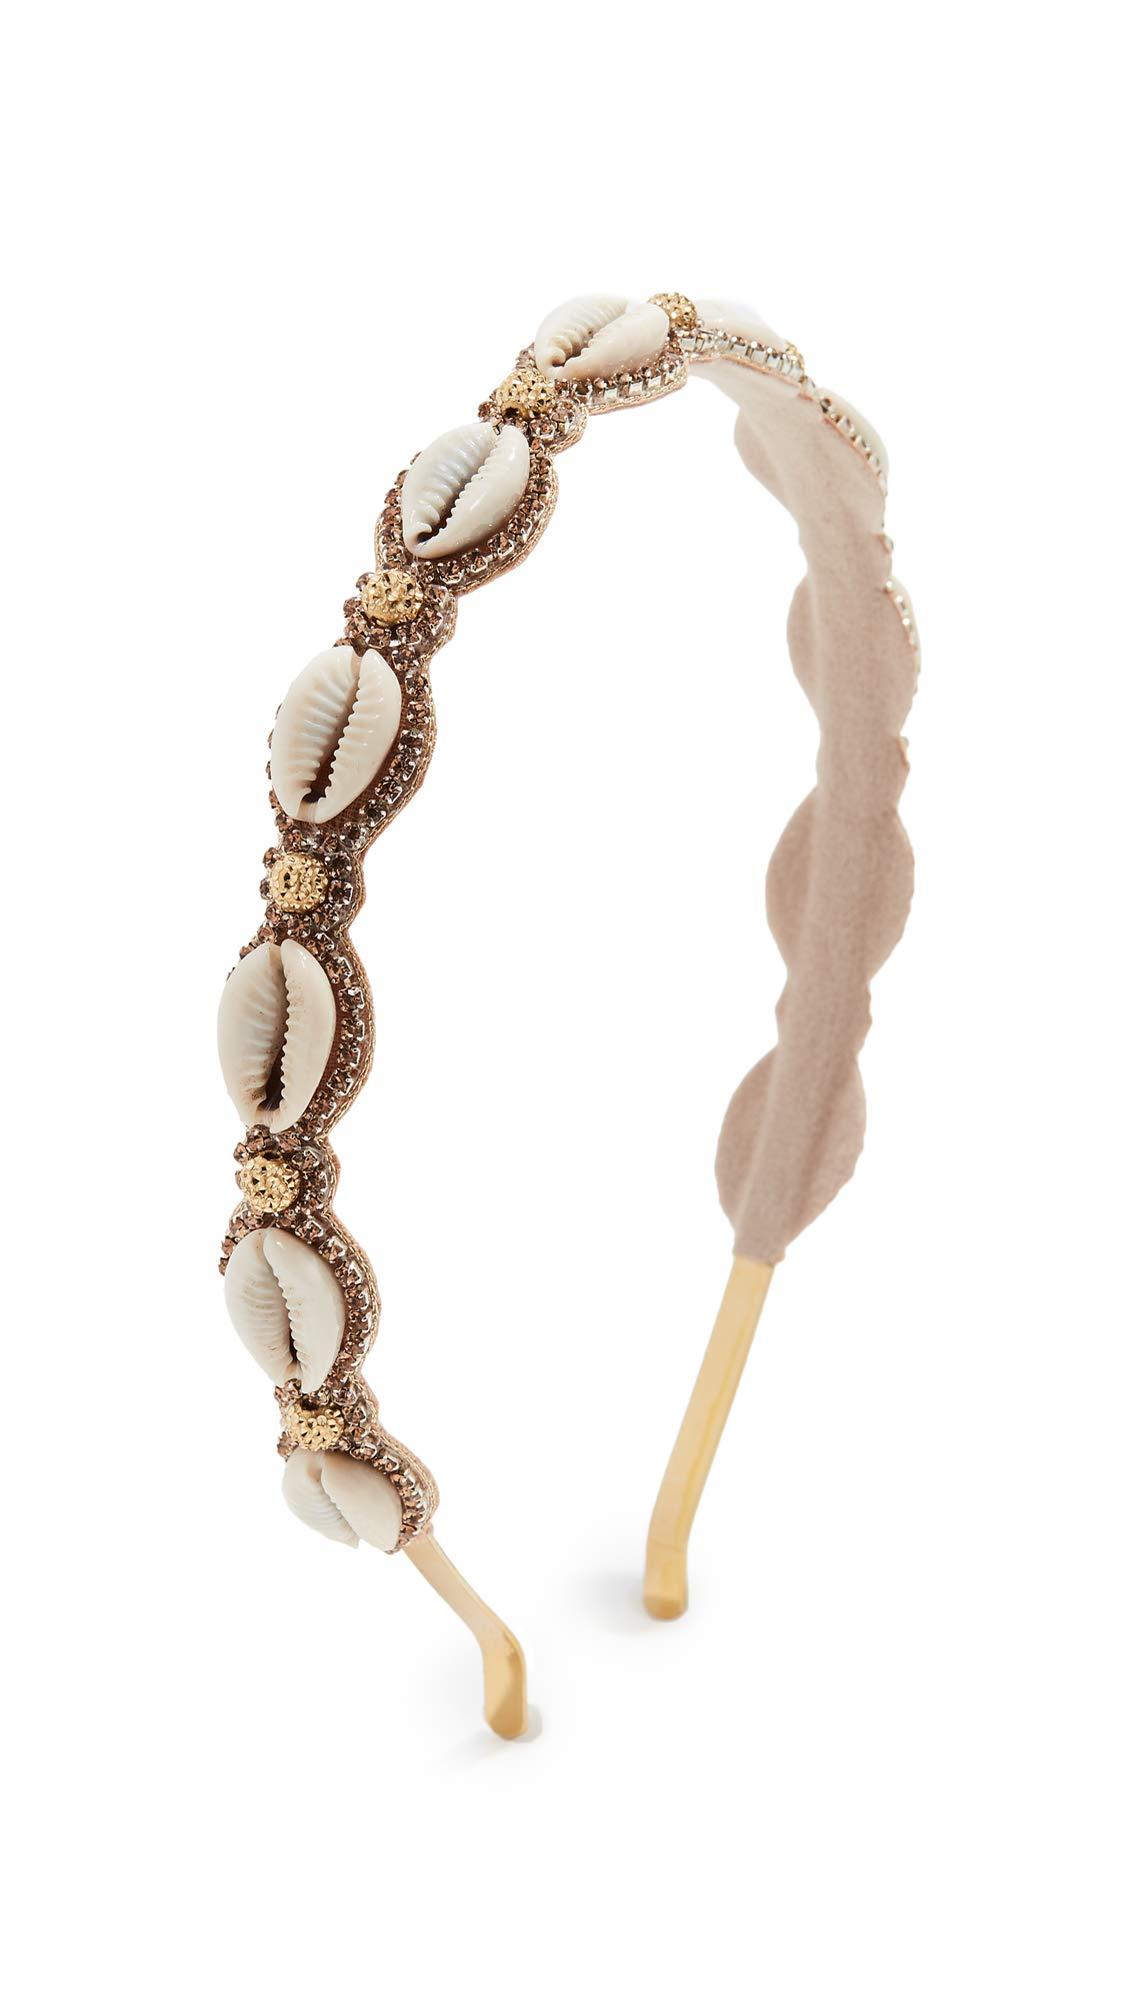 Deepa Gurnani Women's Deepa by Deepa Gurnani Shelley Headband, Ivory, Gold, Off White, One Size